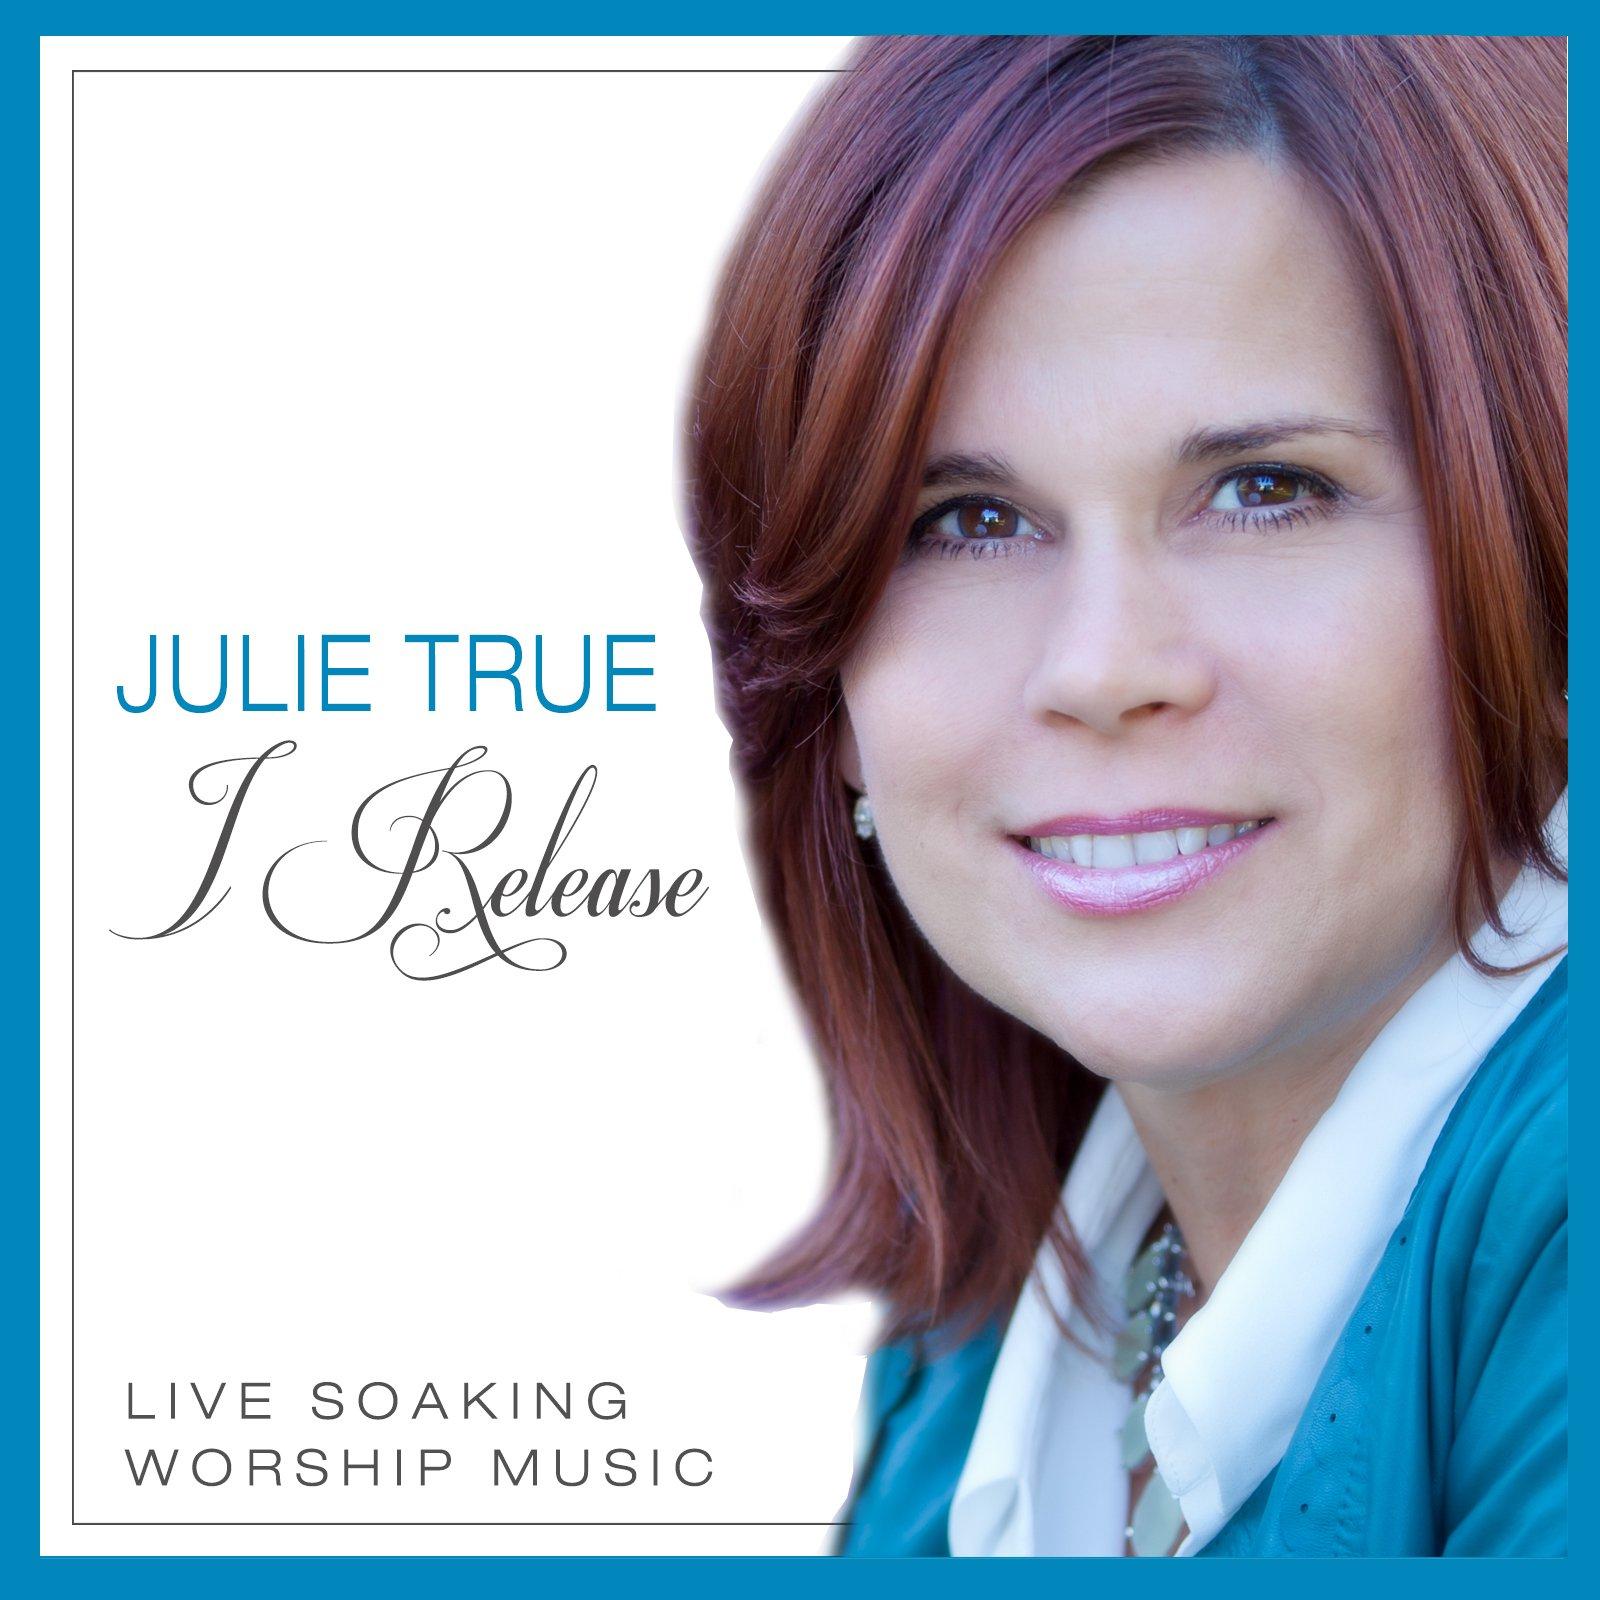 I Release - Live Soaking Worship Music